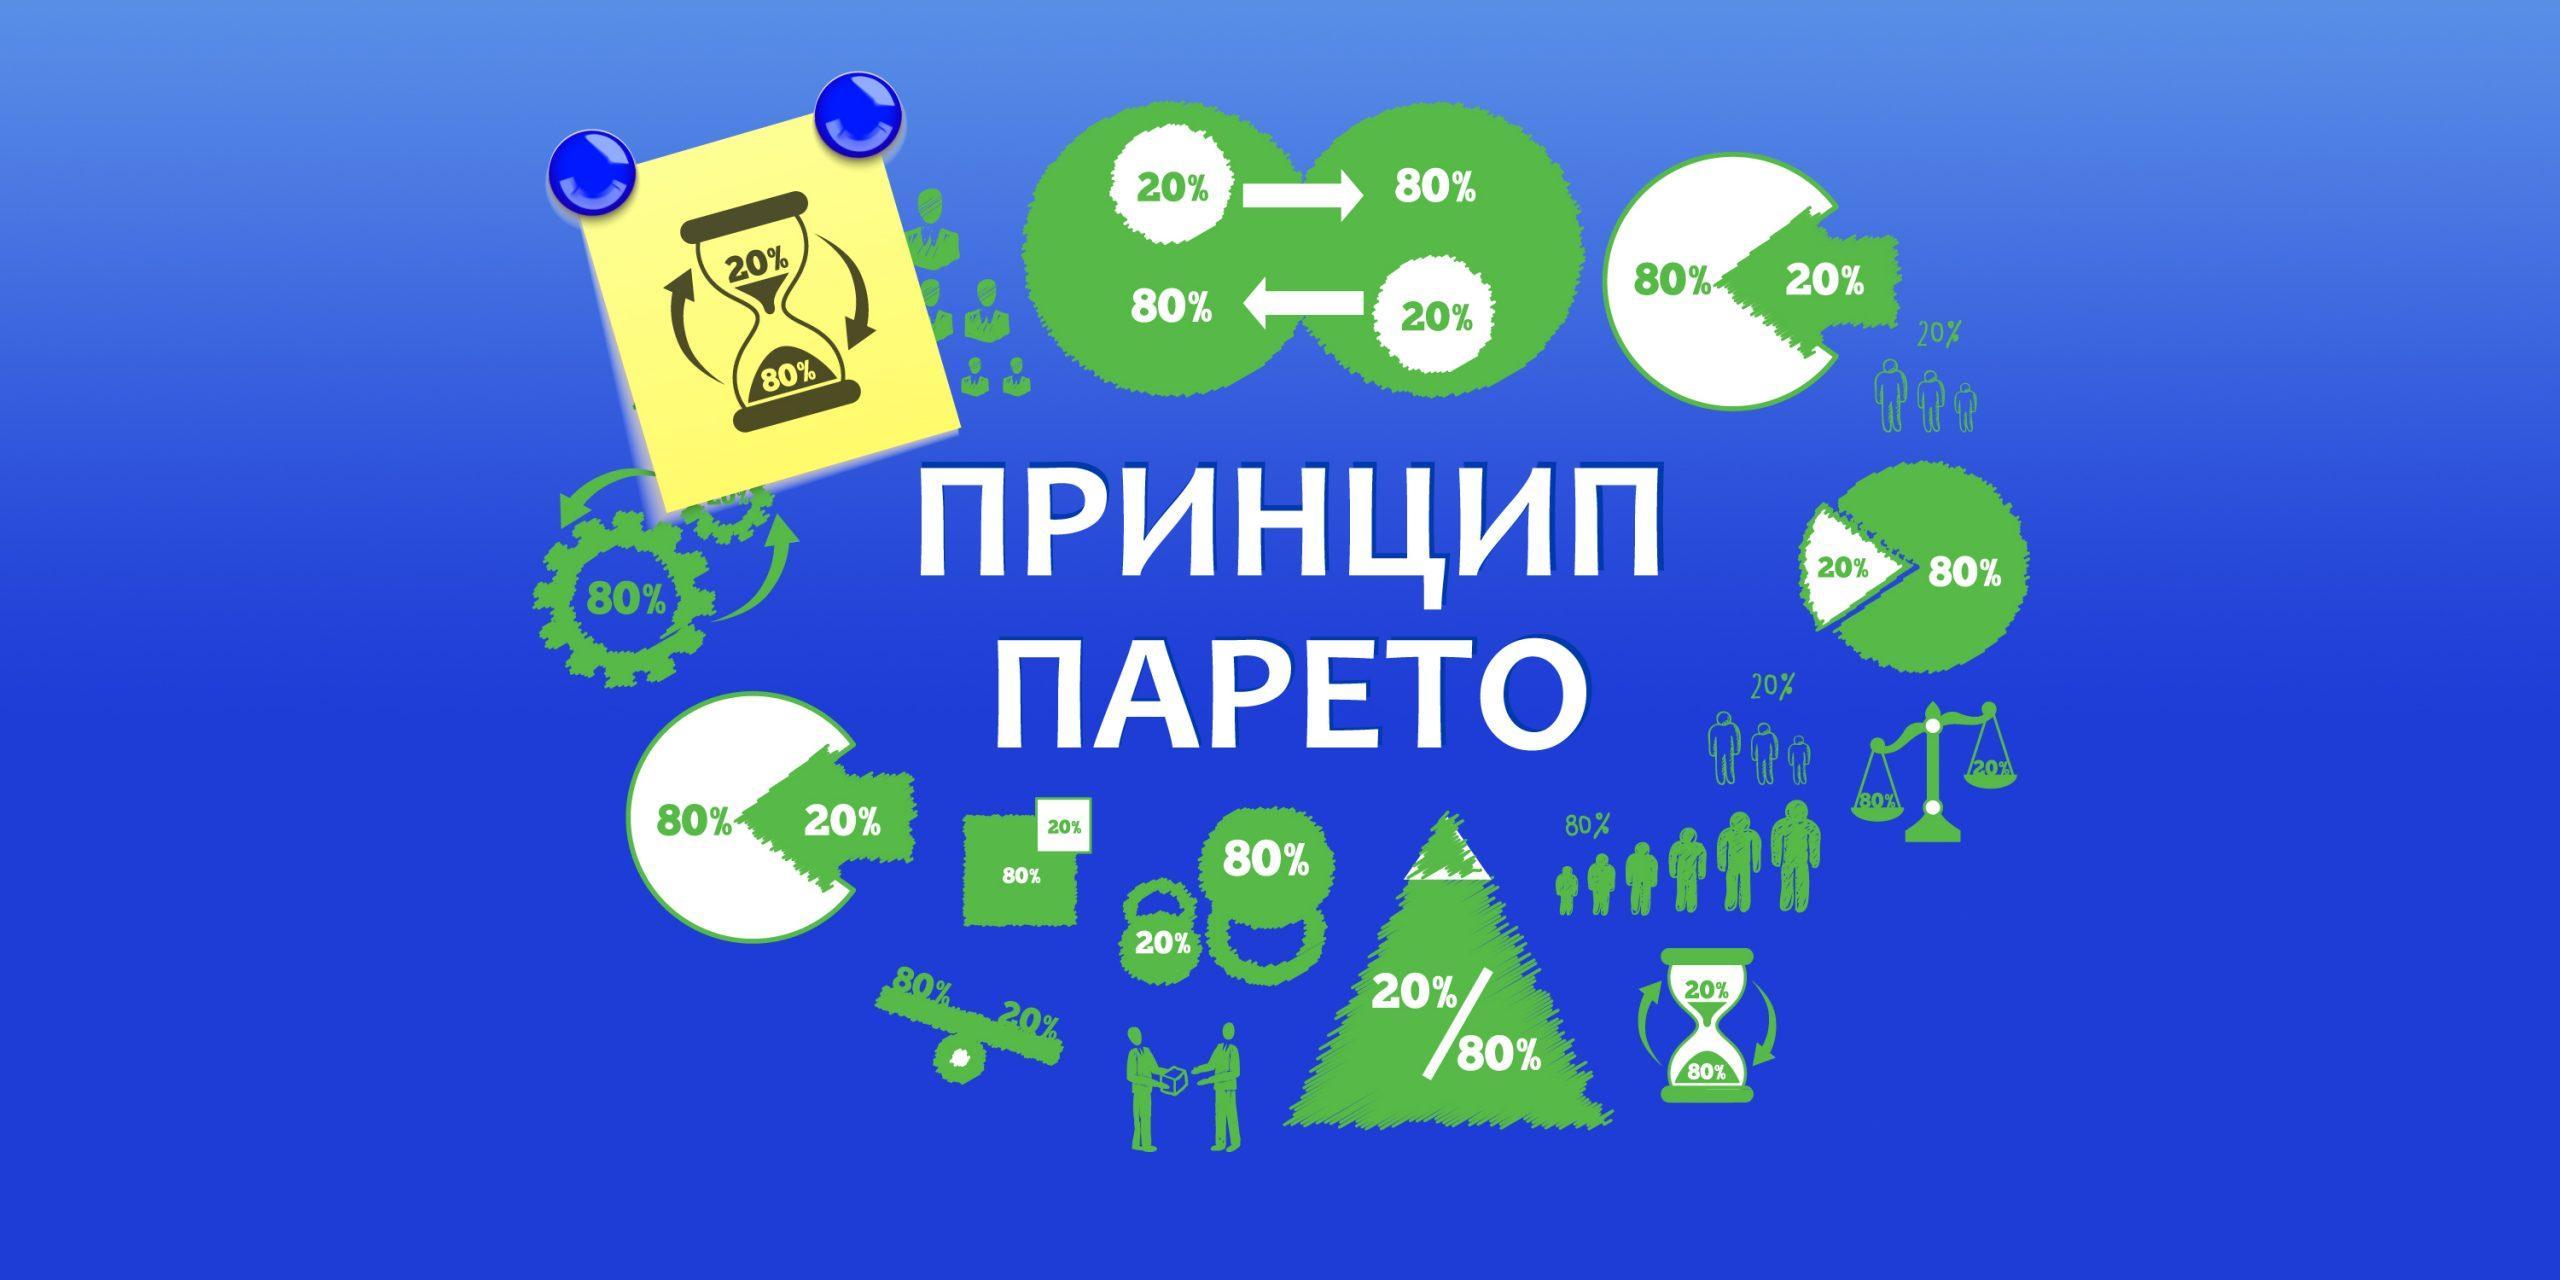 {:en}Pareto Principle and How to Take Advantage of it in Marketing and Business{:}{:ru}Закон Парето как основа для эффективного маркетинга и саморазвития {:}